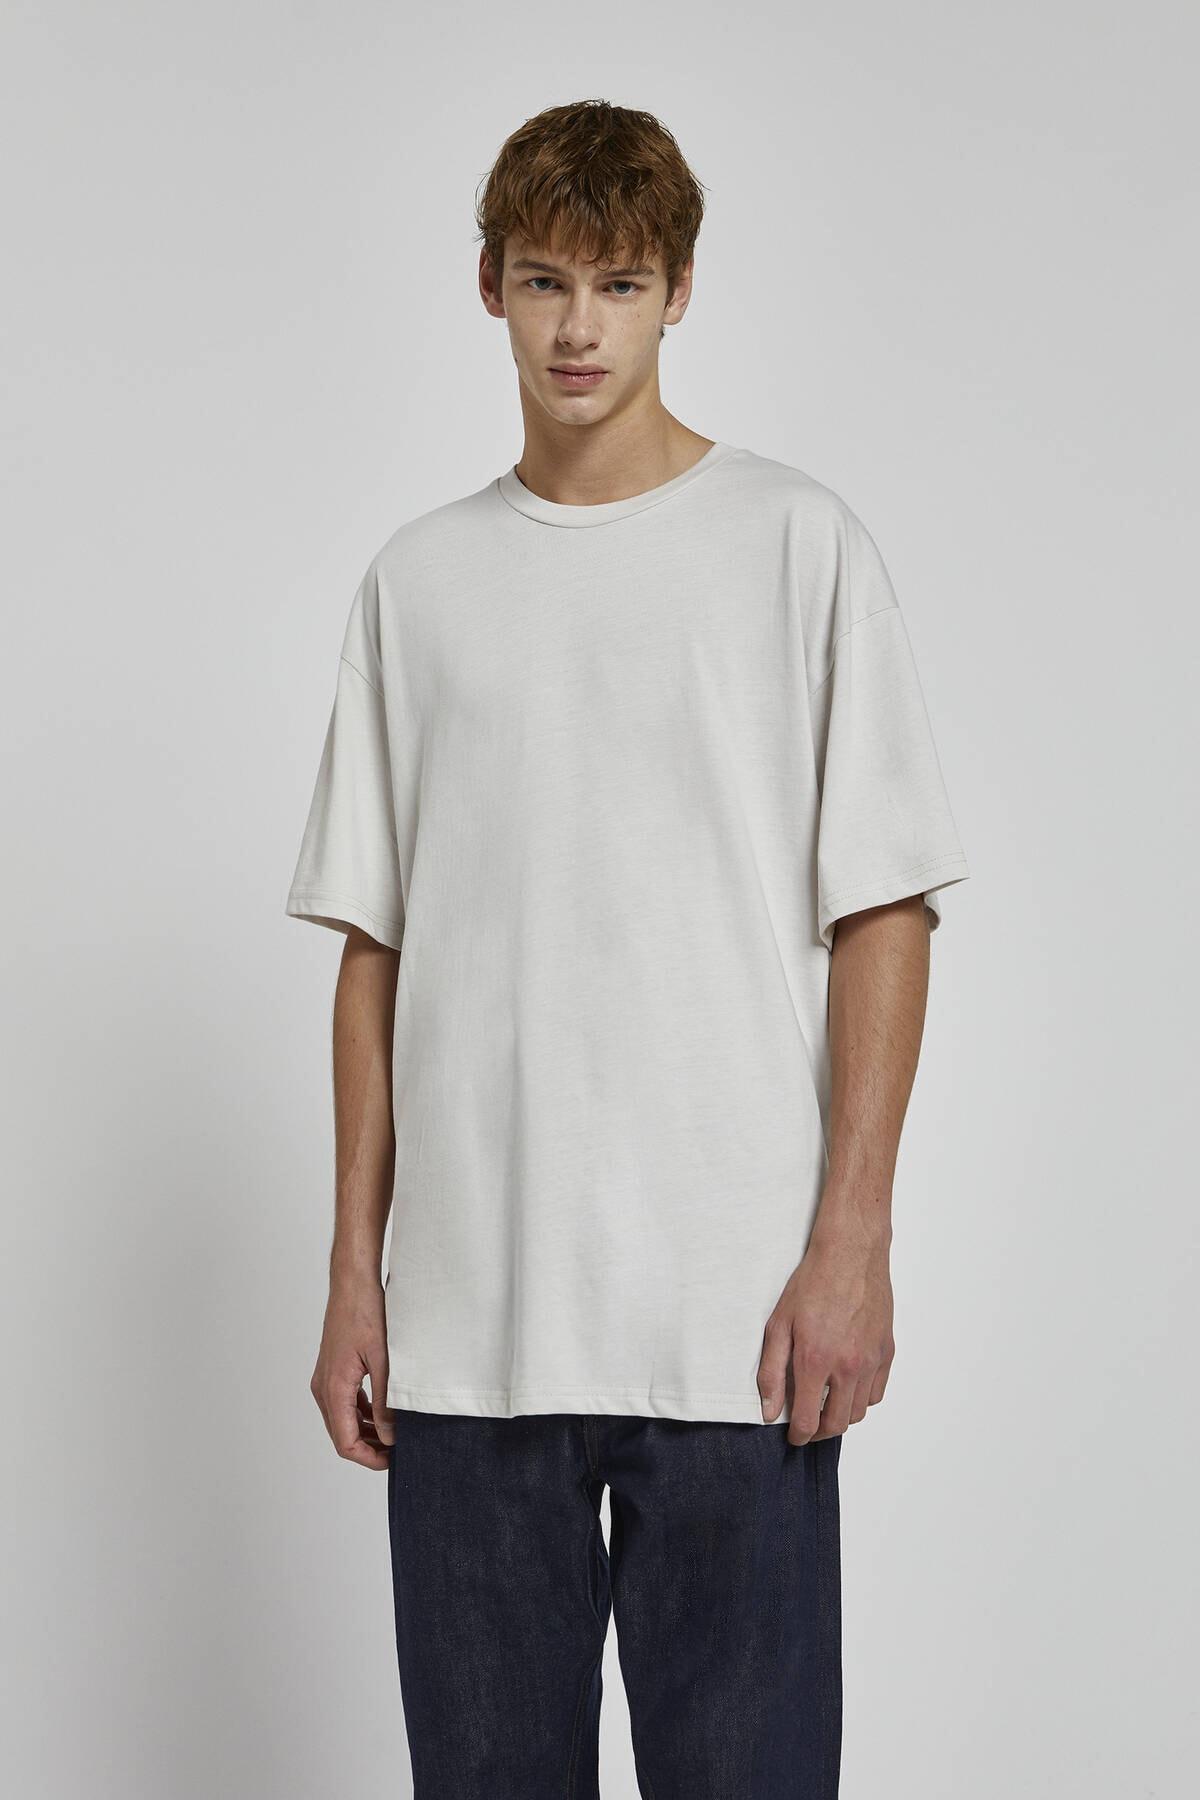 Pull & Bear Erkek Açık Gri Kısa Kollu Oversize T-Shirt 09244936 0